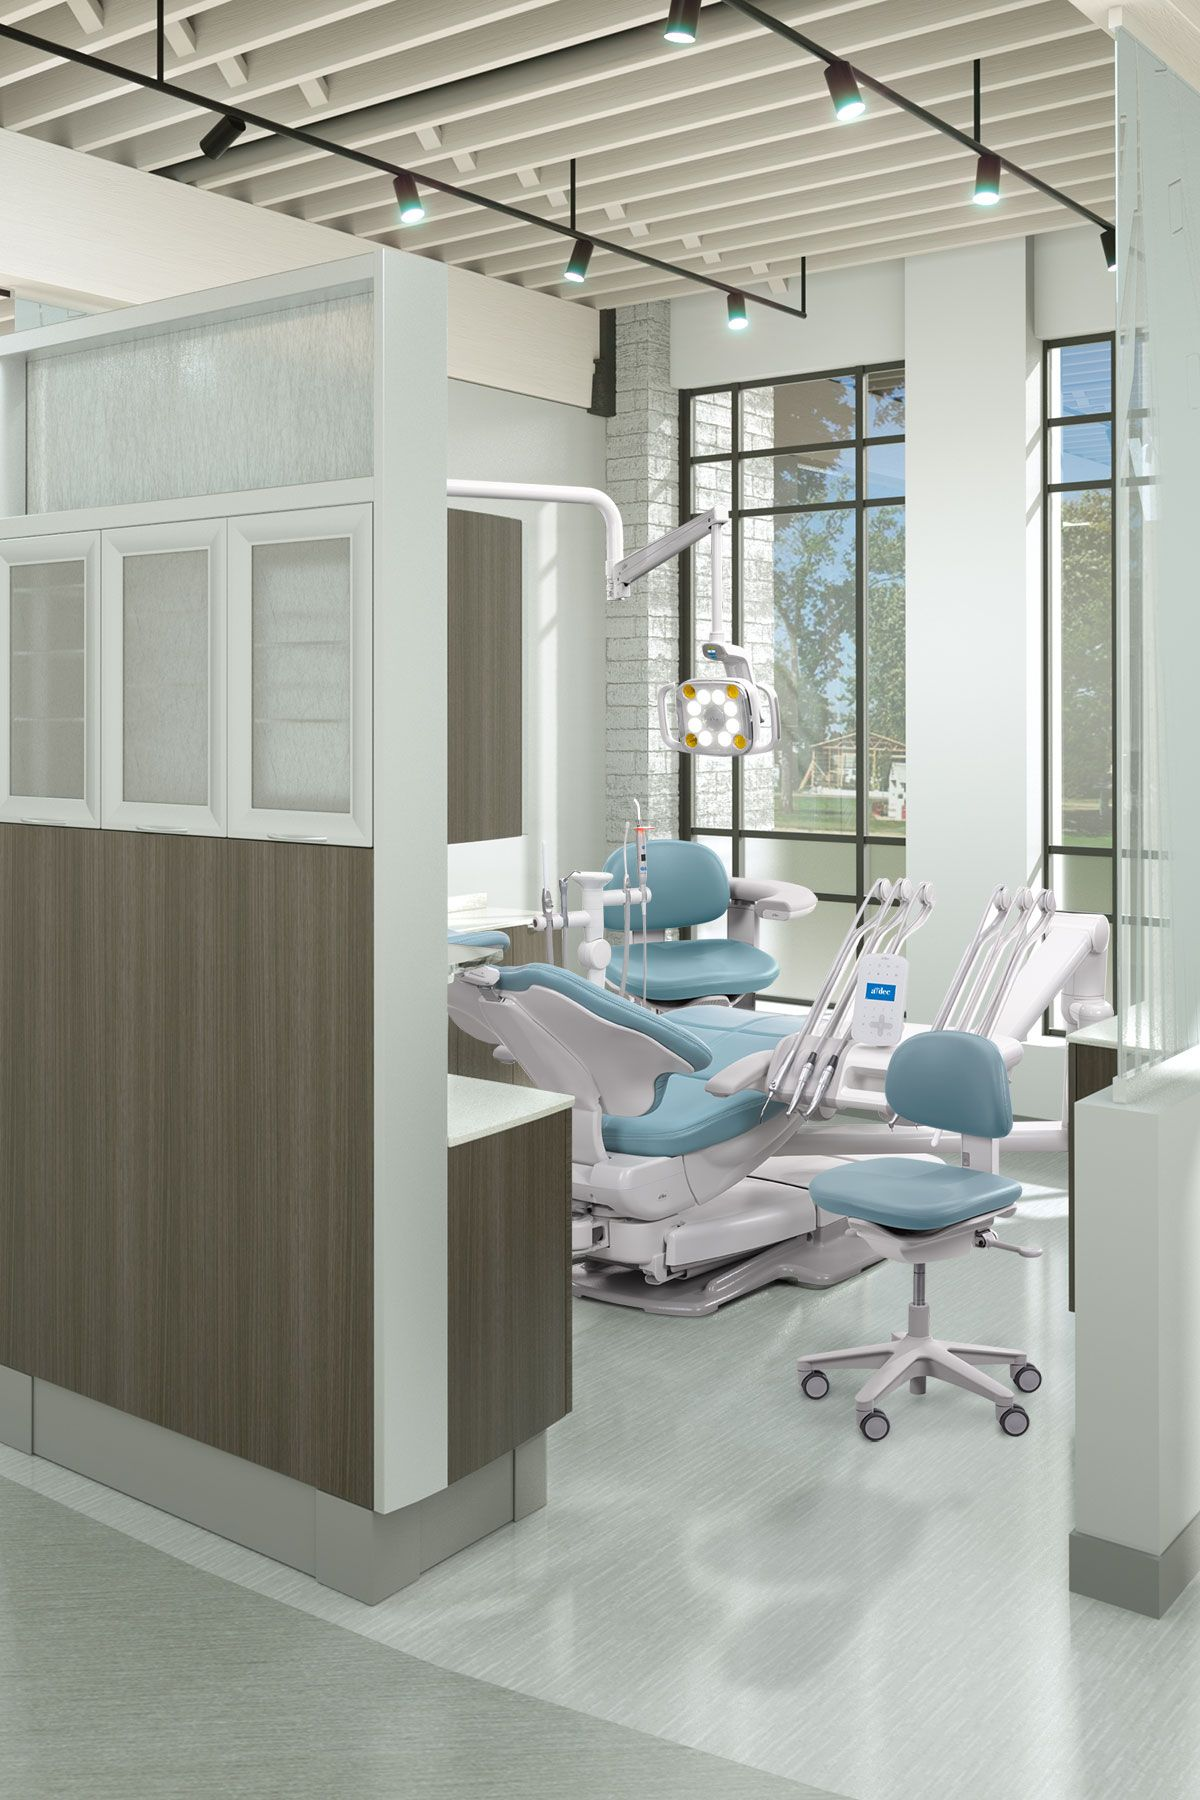 Bright A Dec 500 Dental Operatory Clinic Interior Design Dental Office Design Dentist Office Design